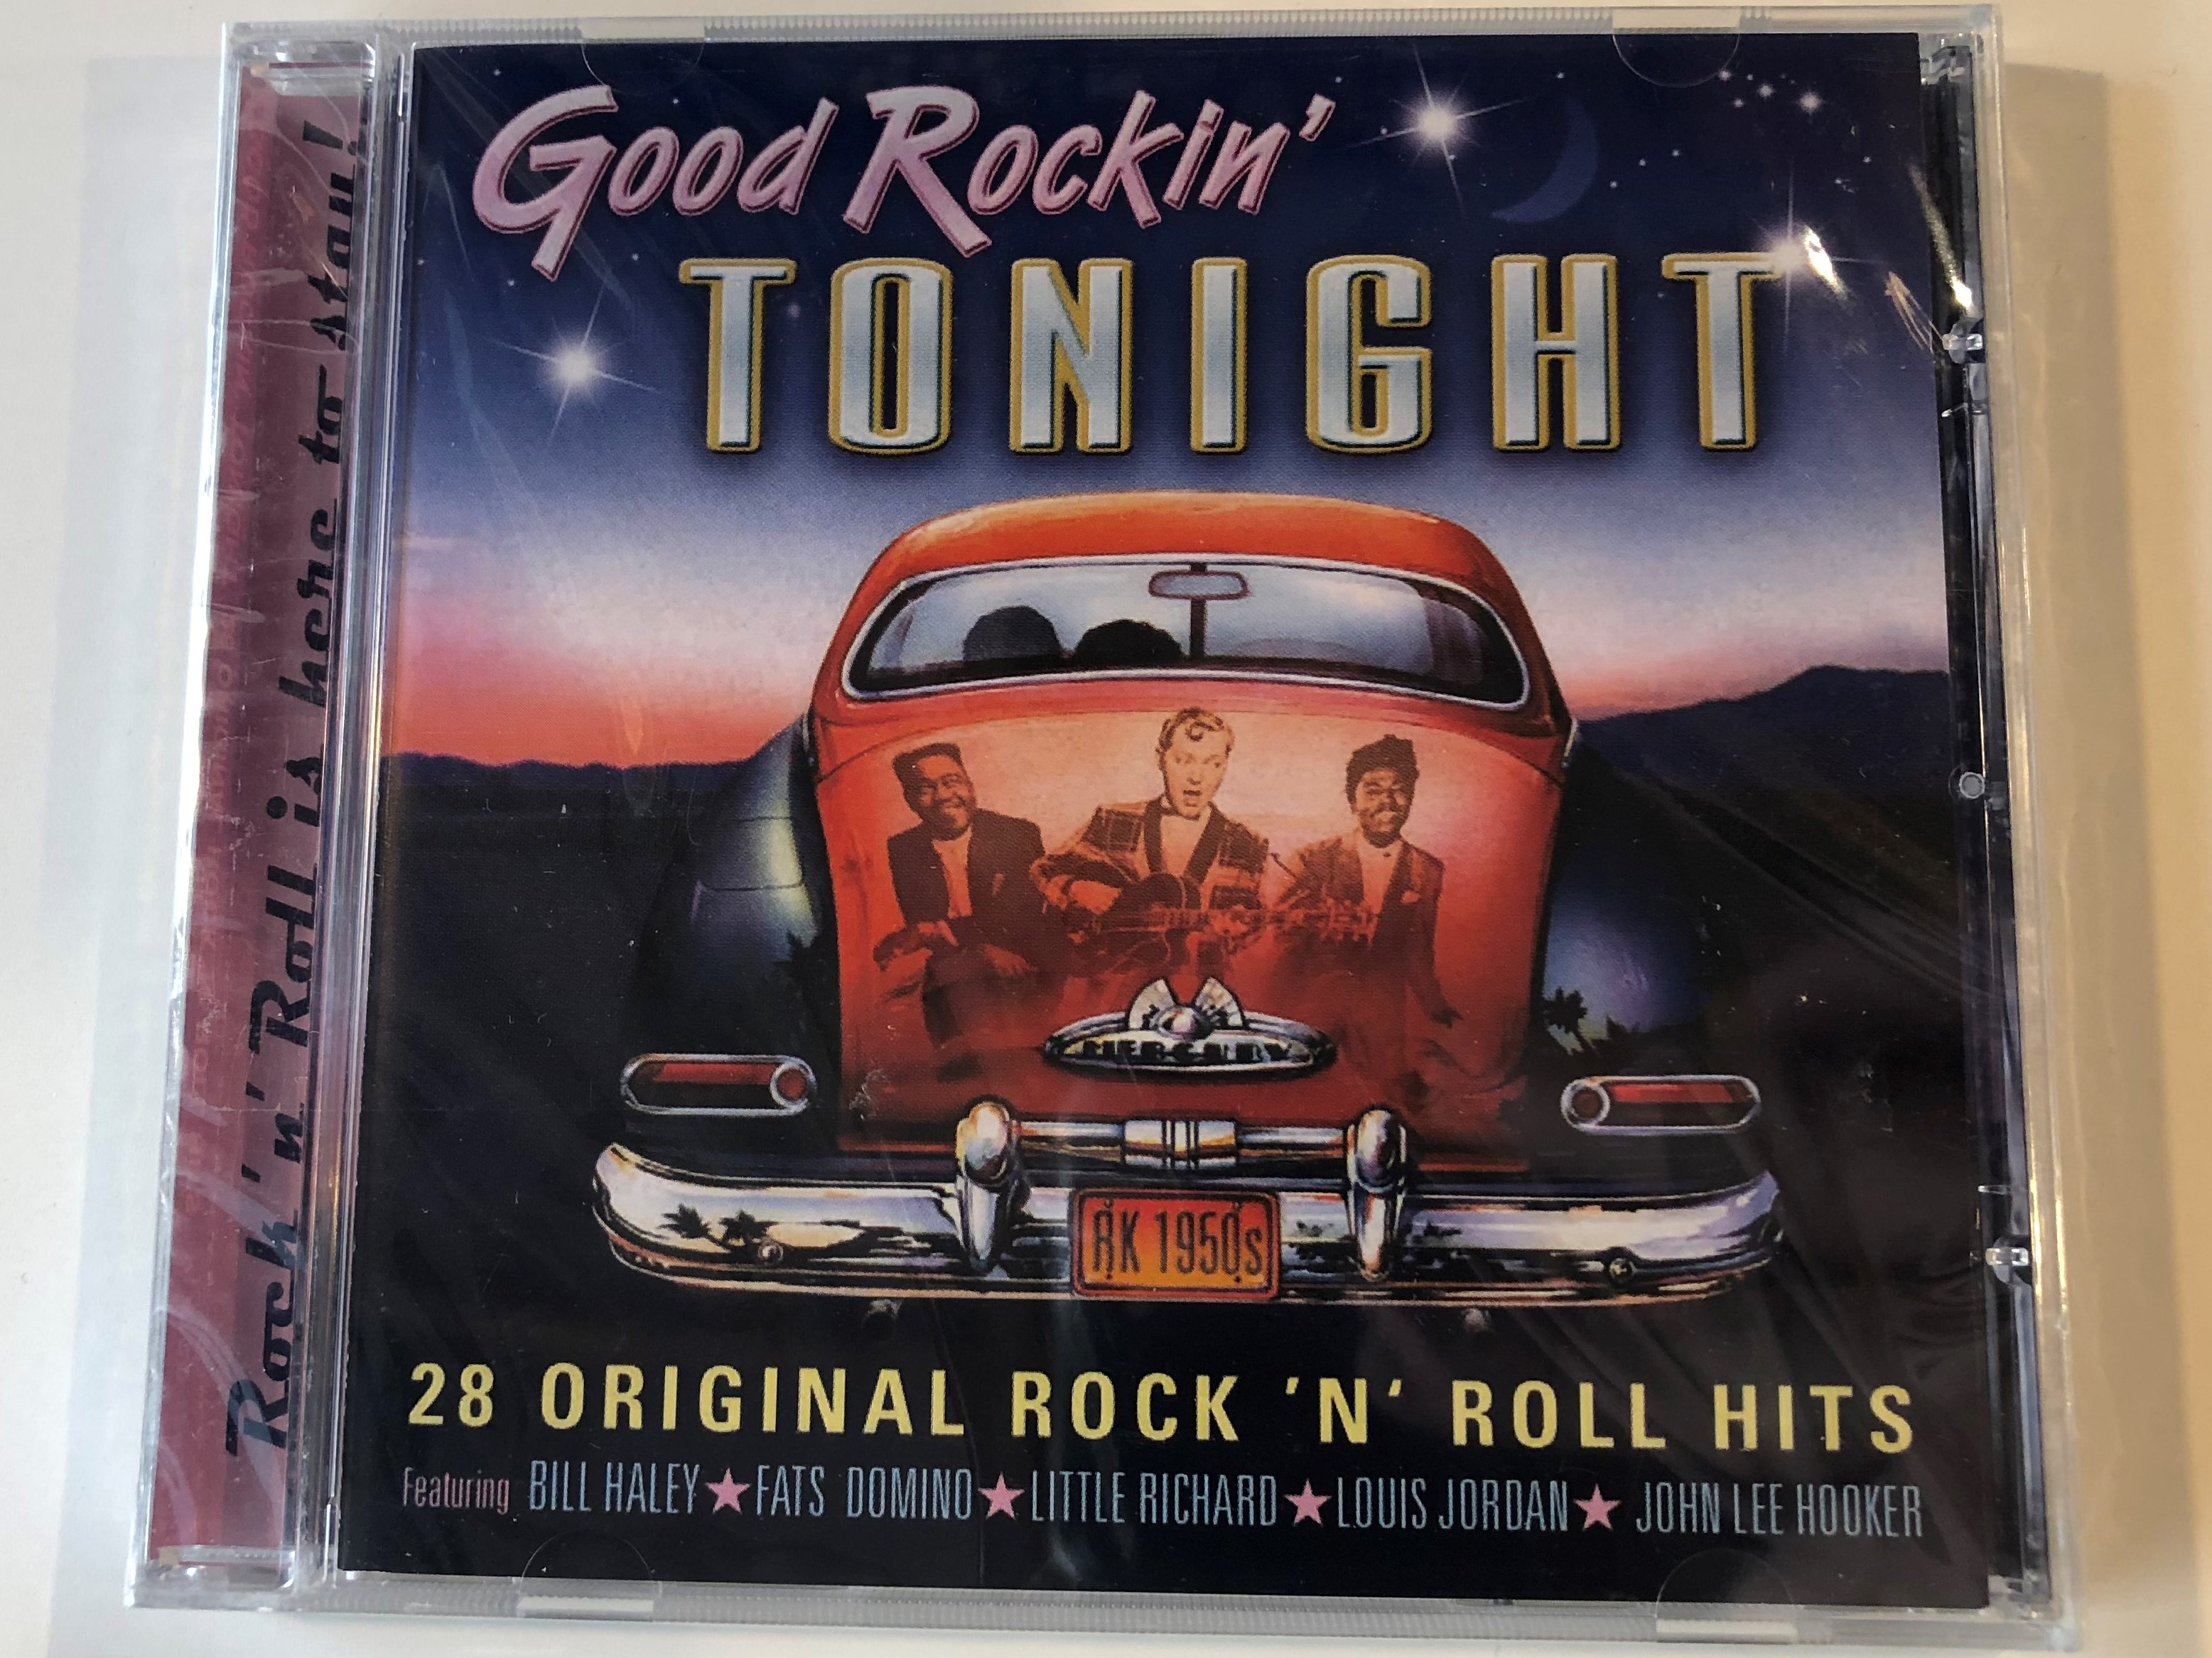 good-rockin-tonight-28-original-rock-n-roll-hits-featuring-bill-haley-fats-domino-little-richard-louis-jordan-john-lee-hooker-prism-leisure-audio-cd-2004-platcd1243-1-.jpg